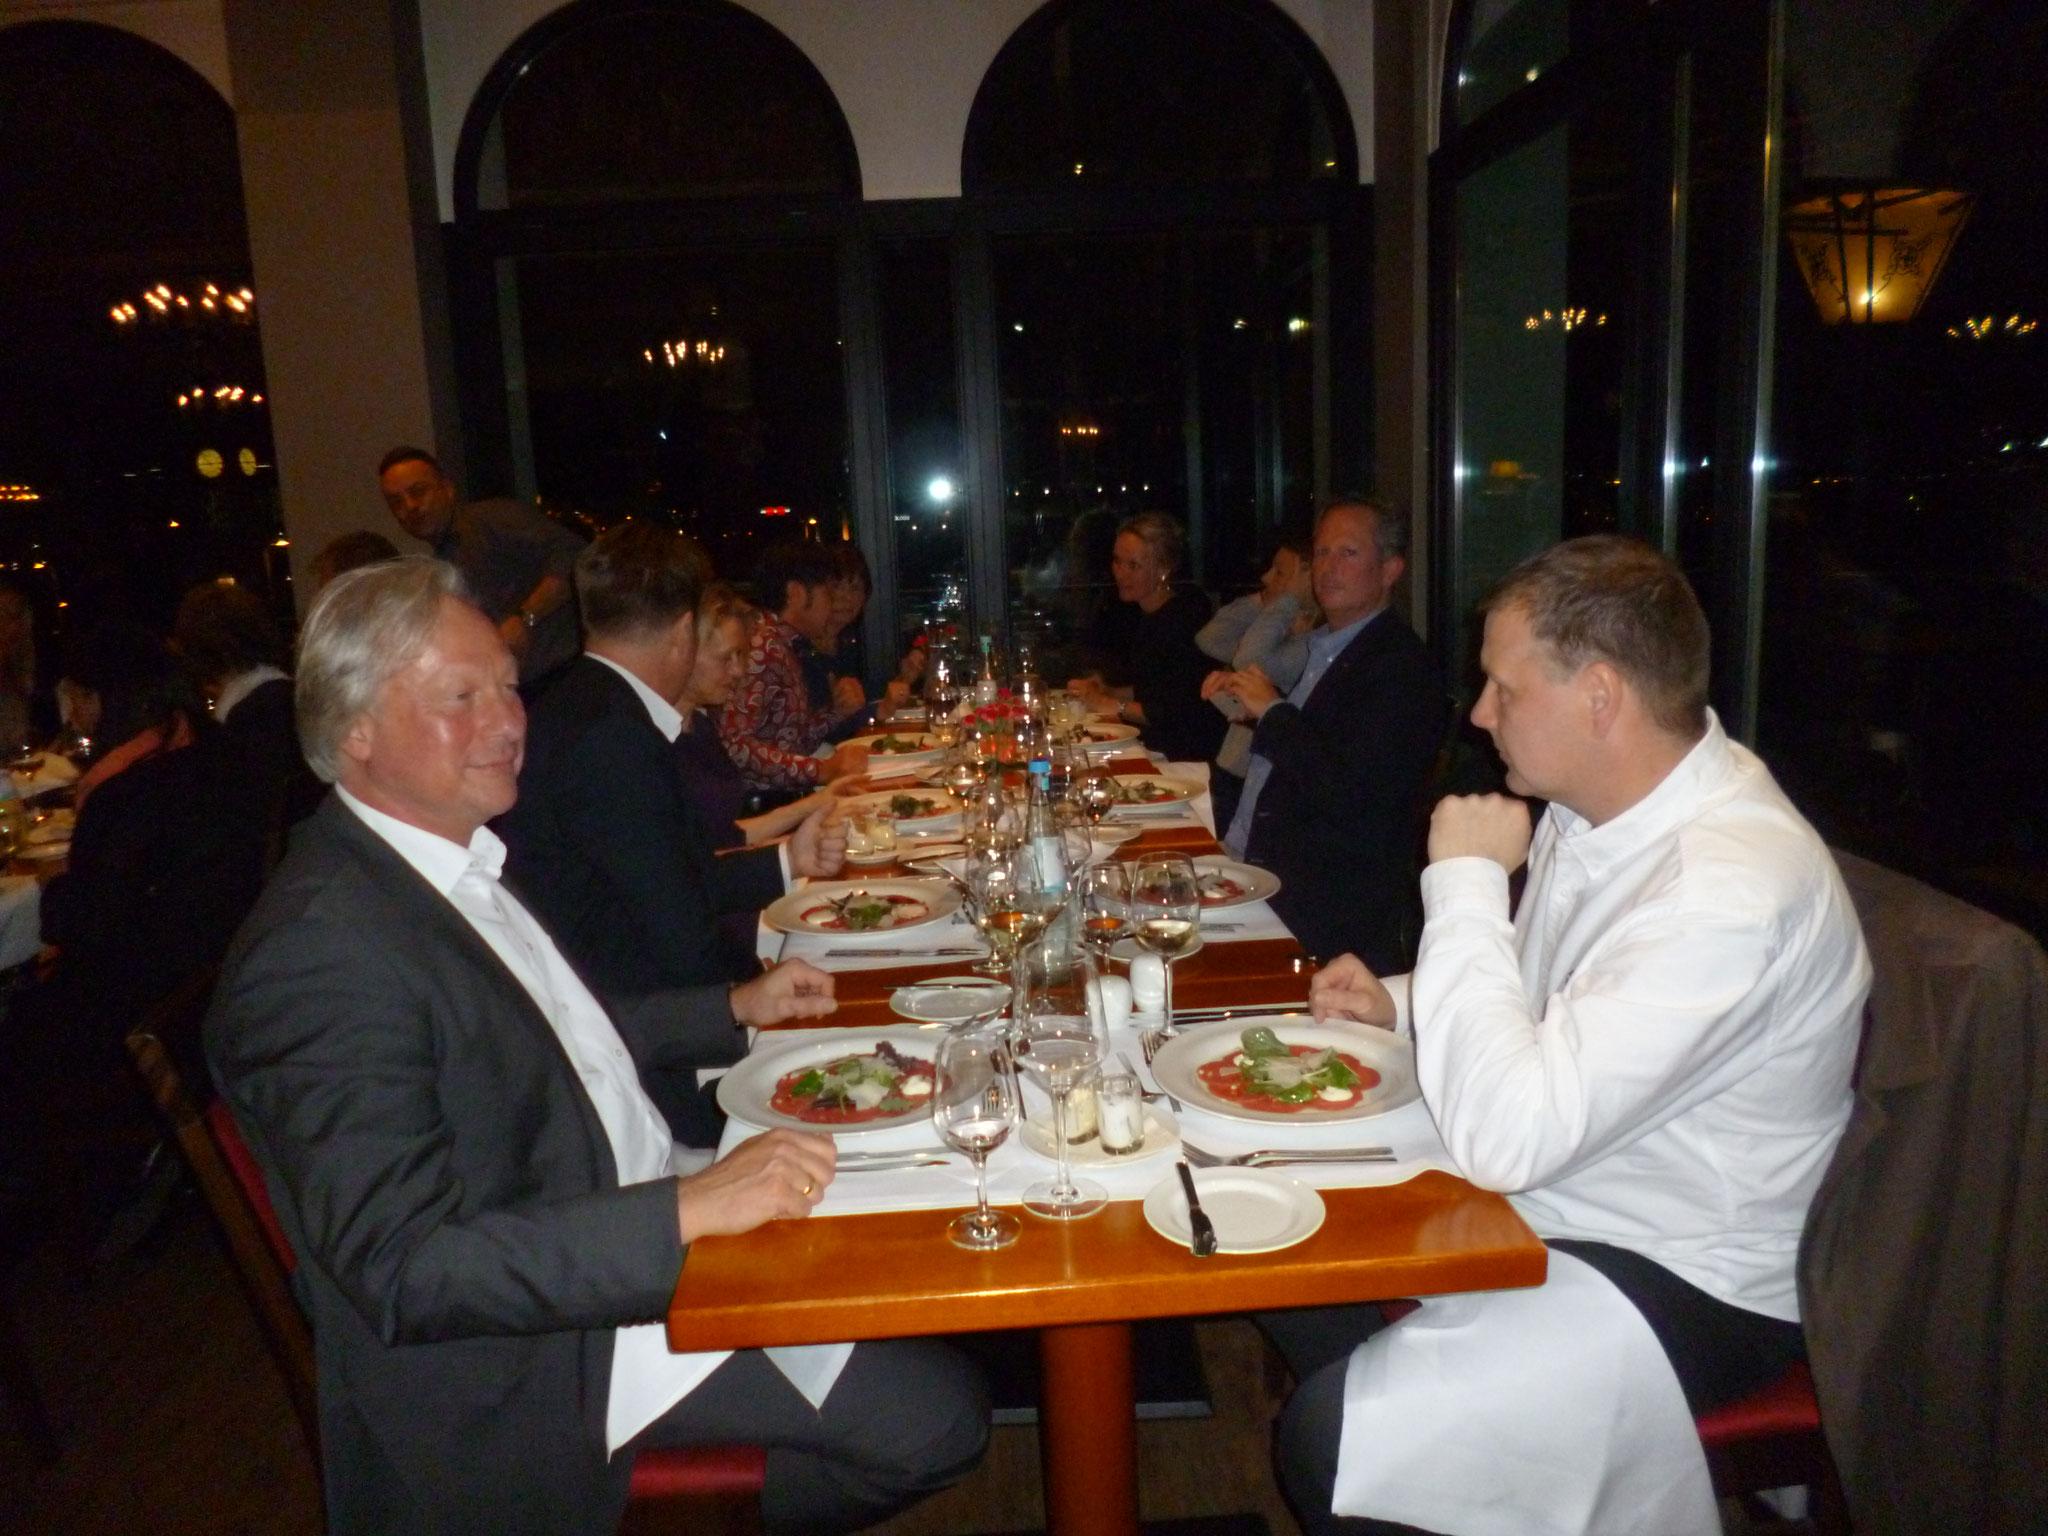 Expandeers banquet dinner